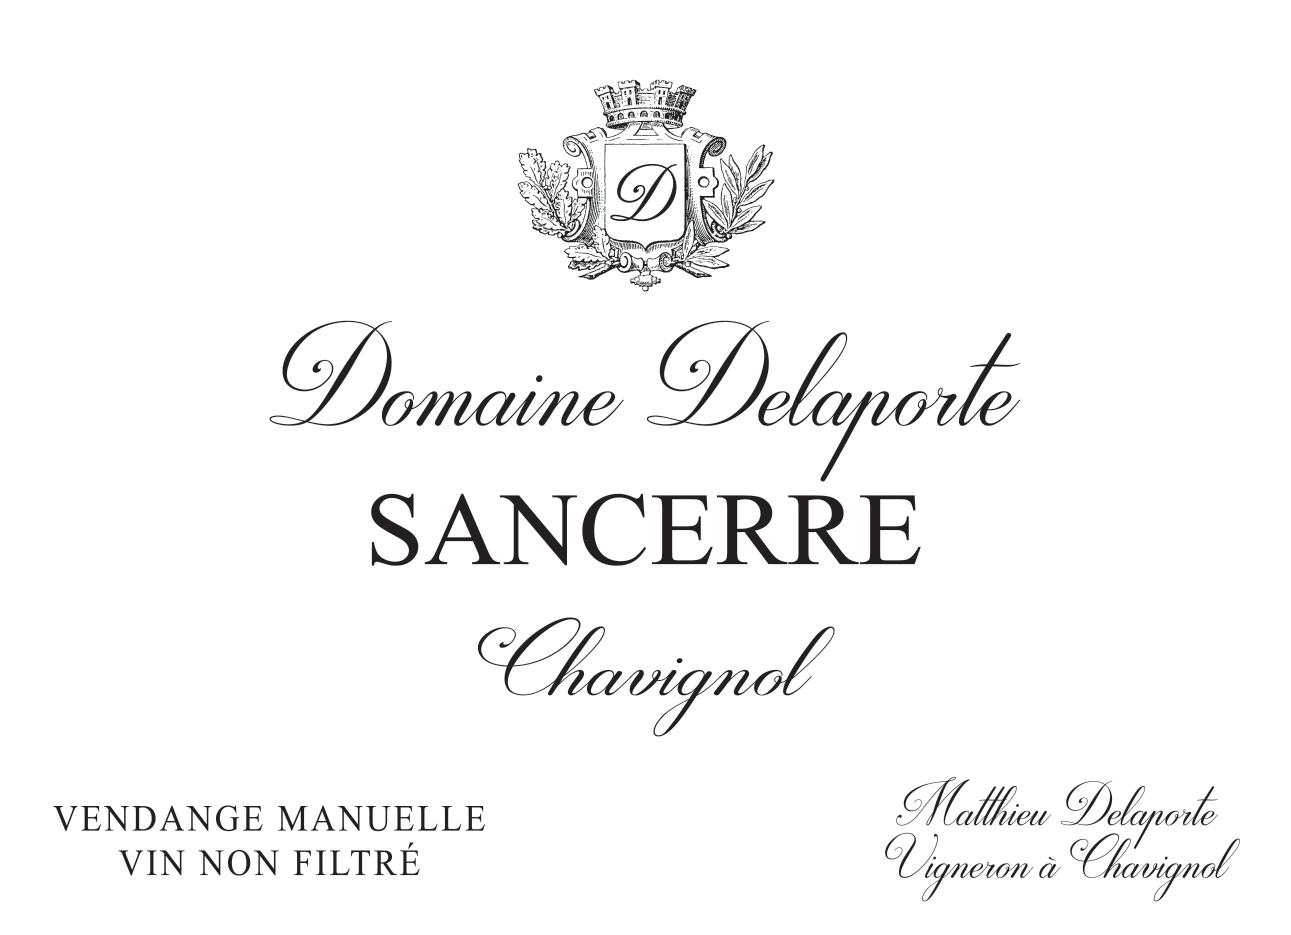 Delaporte Chavignol Sancerre (Red, White, Rosé) Label.jpg